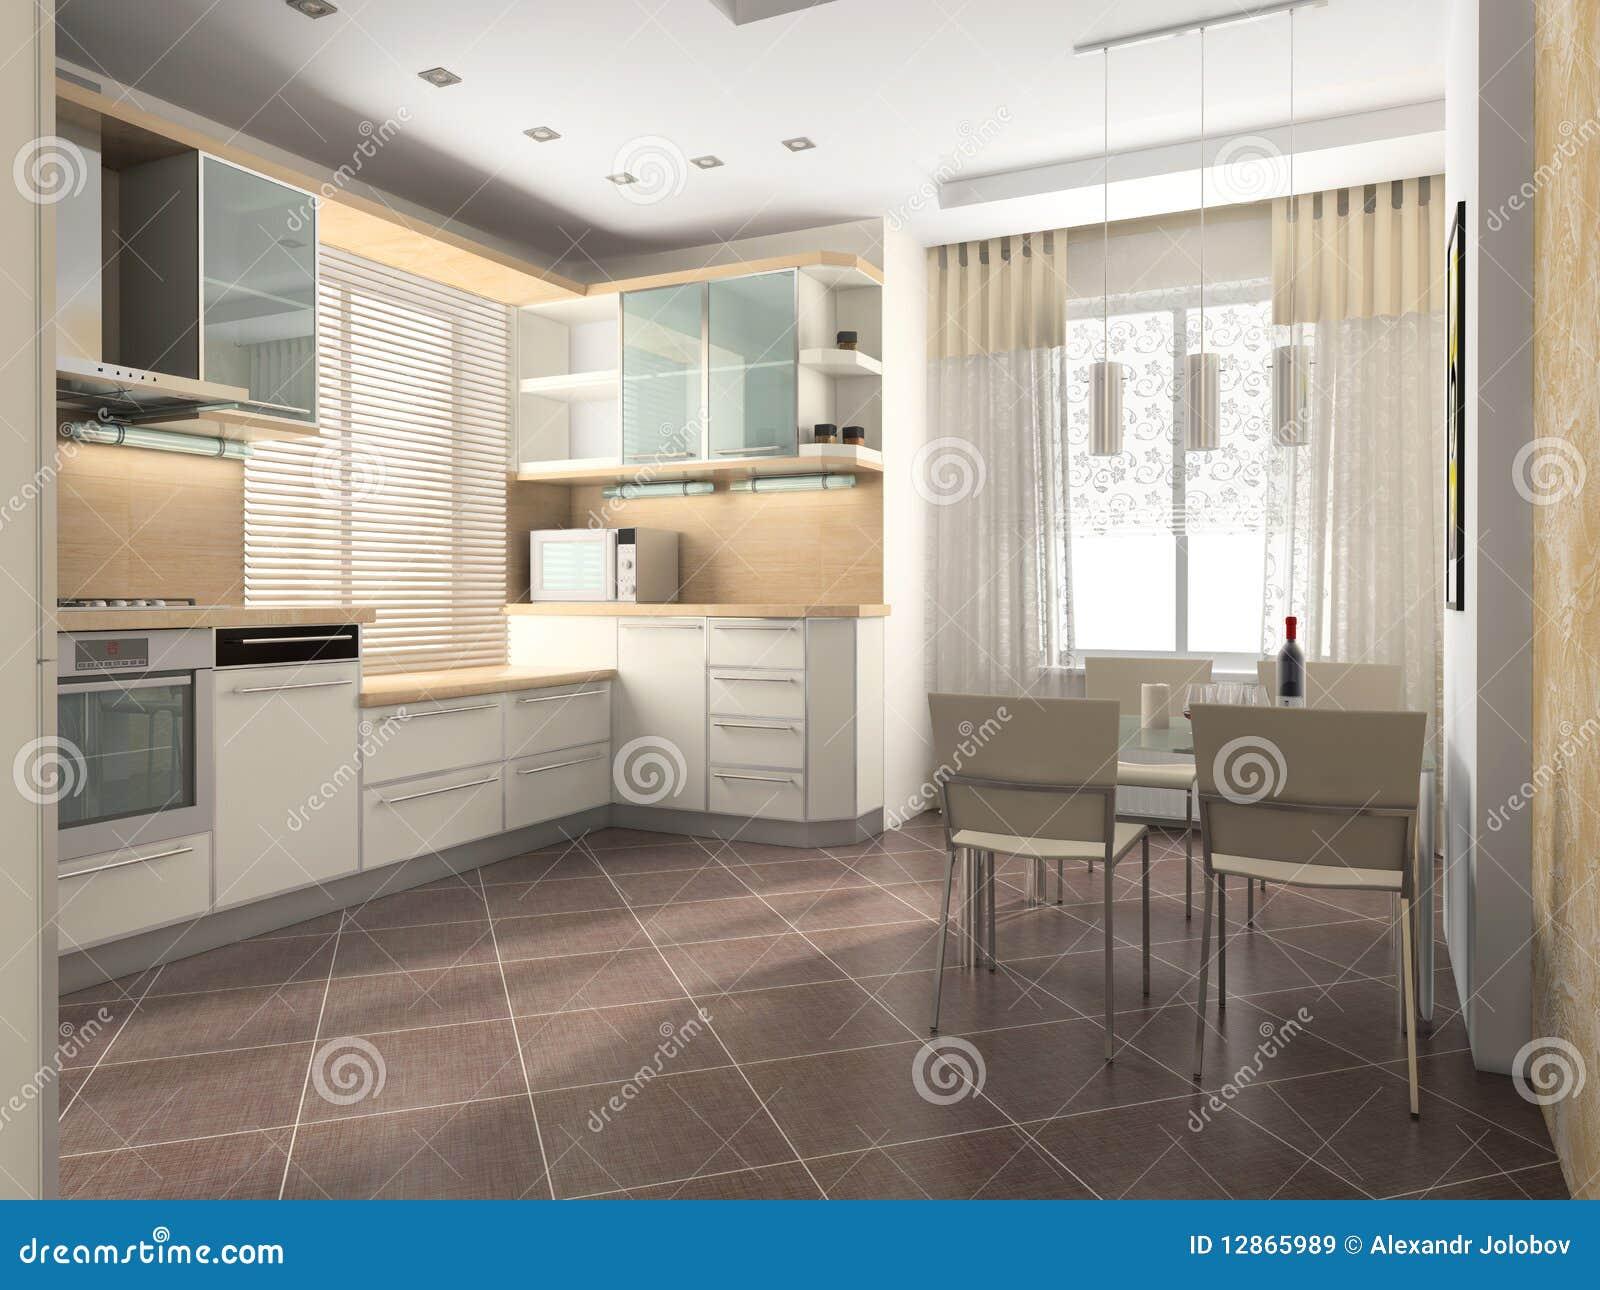 Wewnętrzna Kuchnia Obrazy Royalty Free  Obraz 12865989 -> Kuchnia Wloska Obrazy